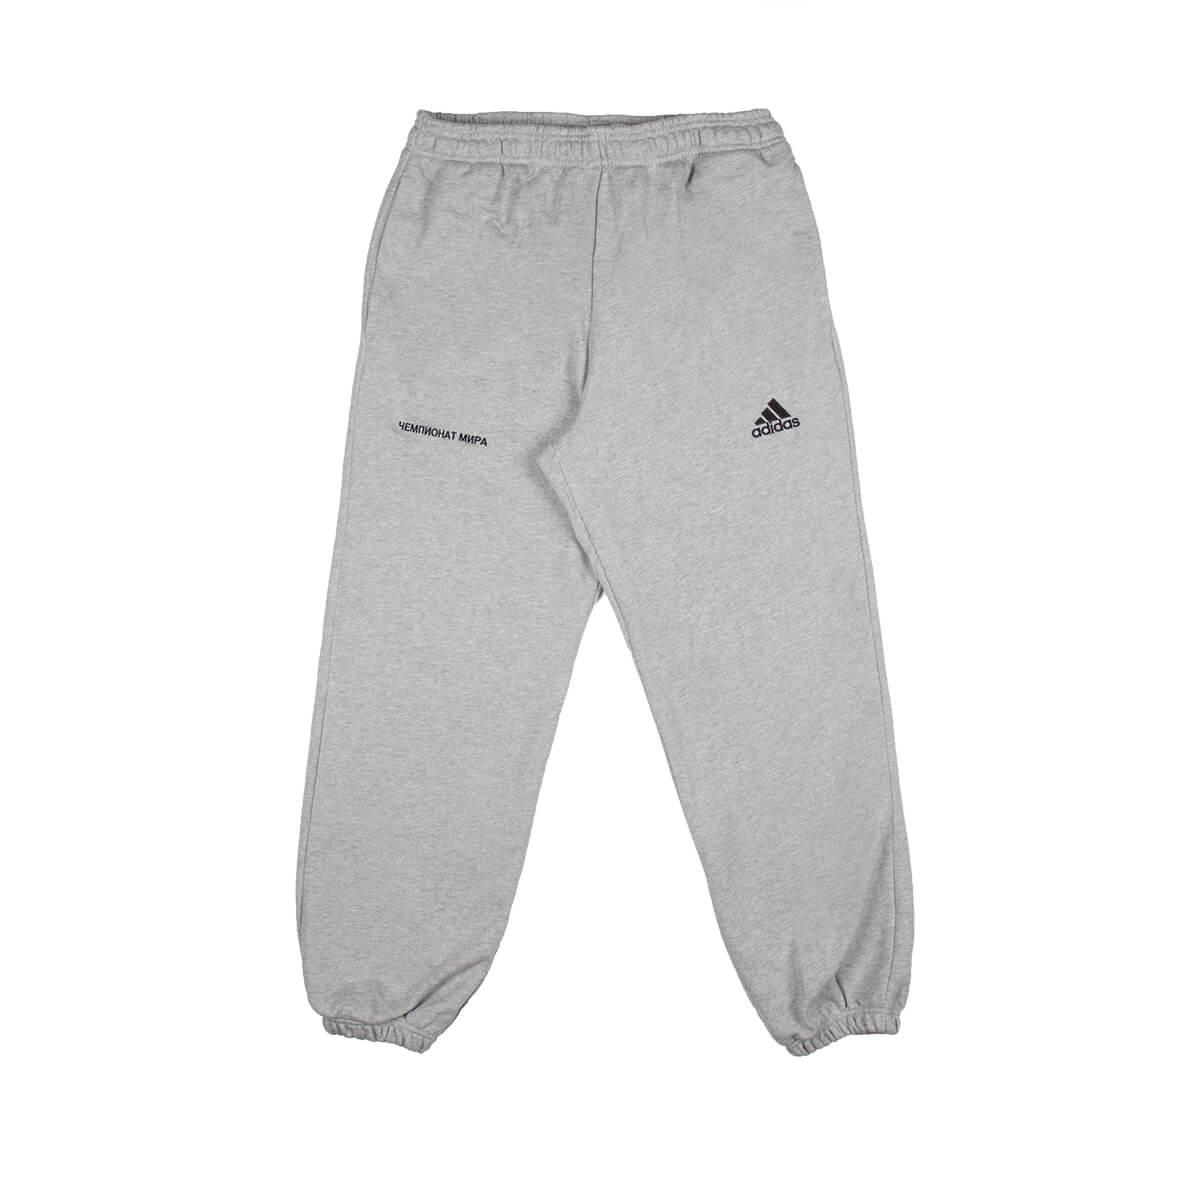 the latest 94eff 77218 Gosha Rubchinskiy x Adidas sweatpants - Grey